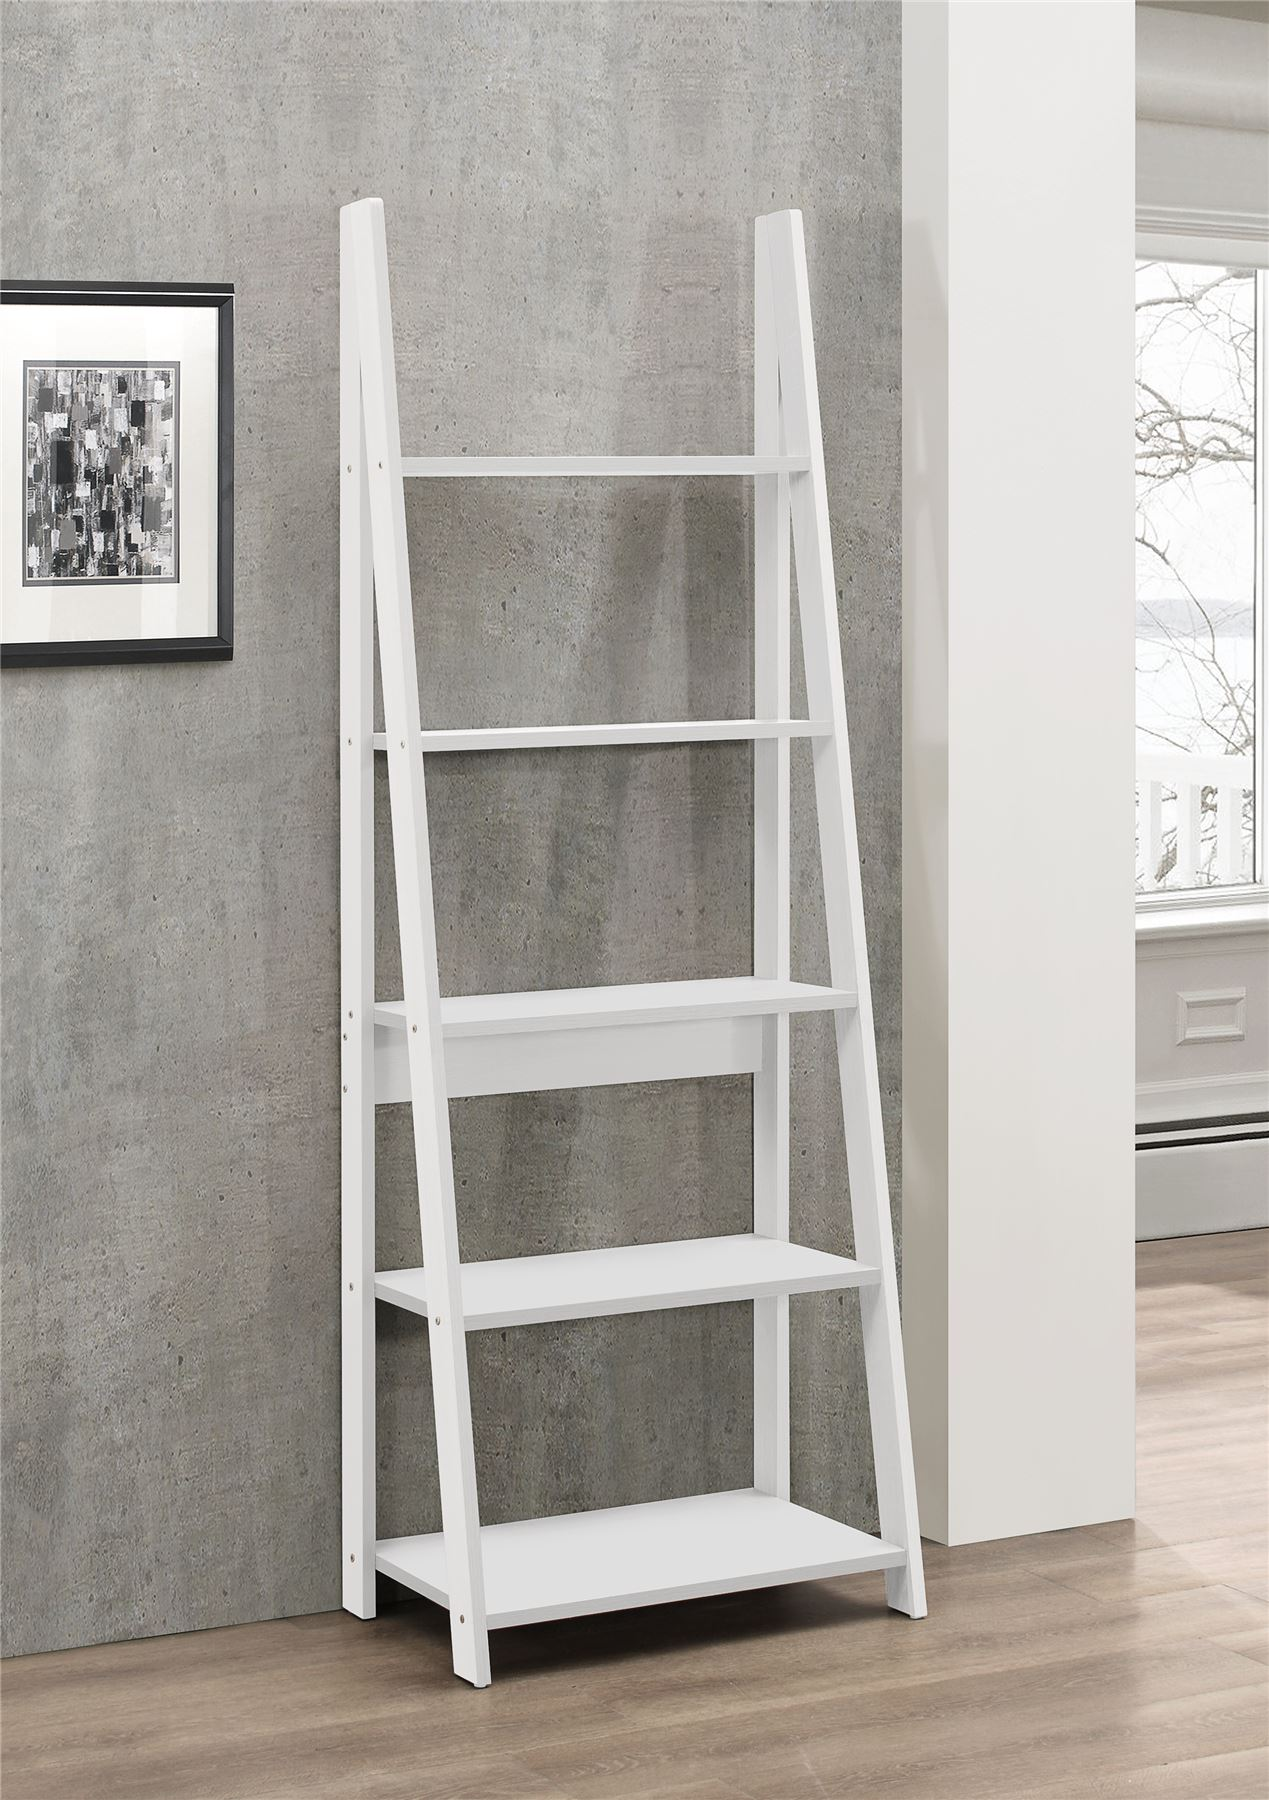 Birlea Nordic Scandinavian Retro Ladder Bookcase Shelving Shelf Unit White EBay